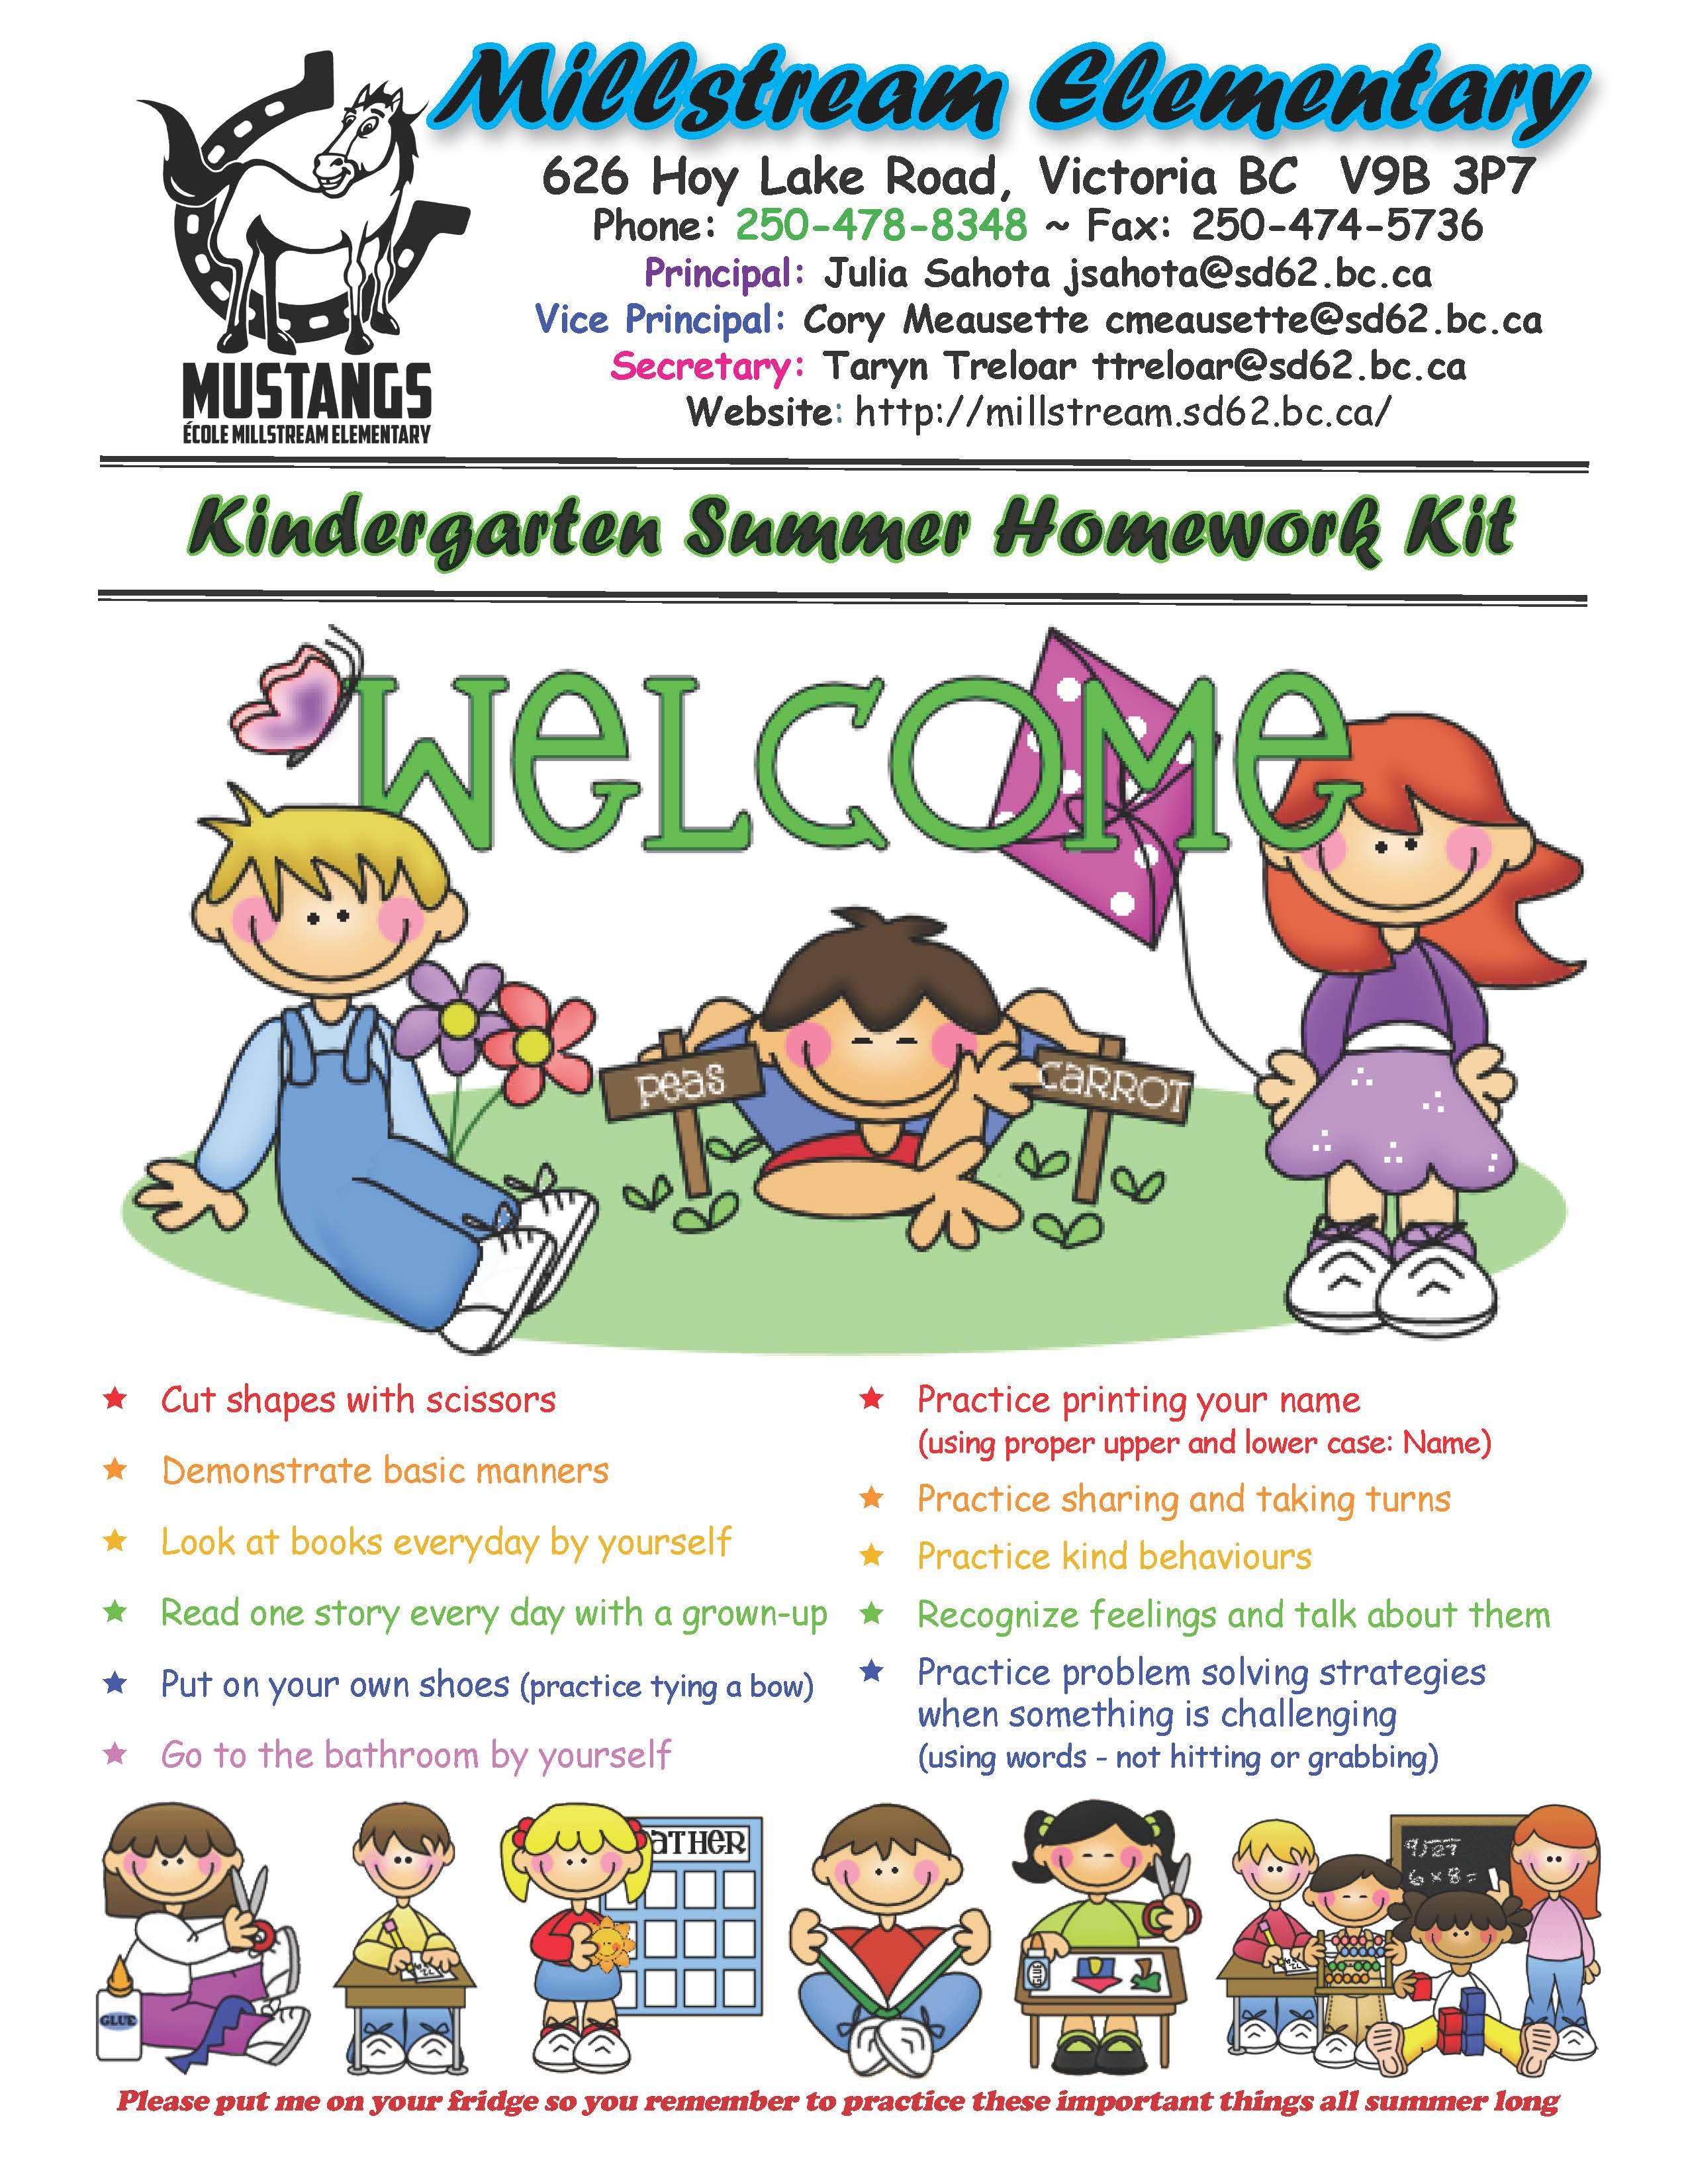 HOMEWORK KIT - KINDERGARTEN_Page_1